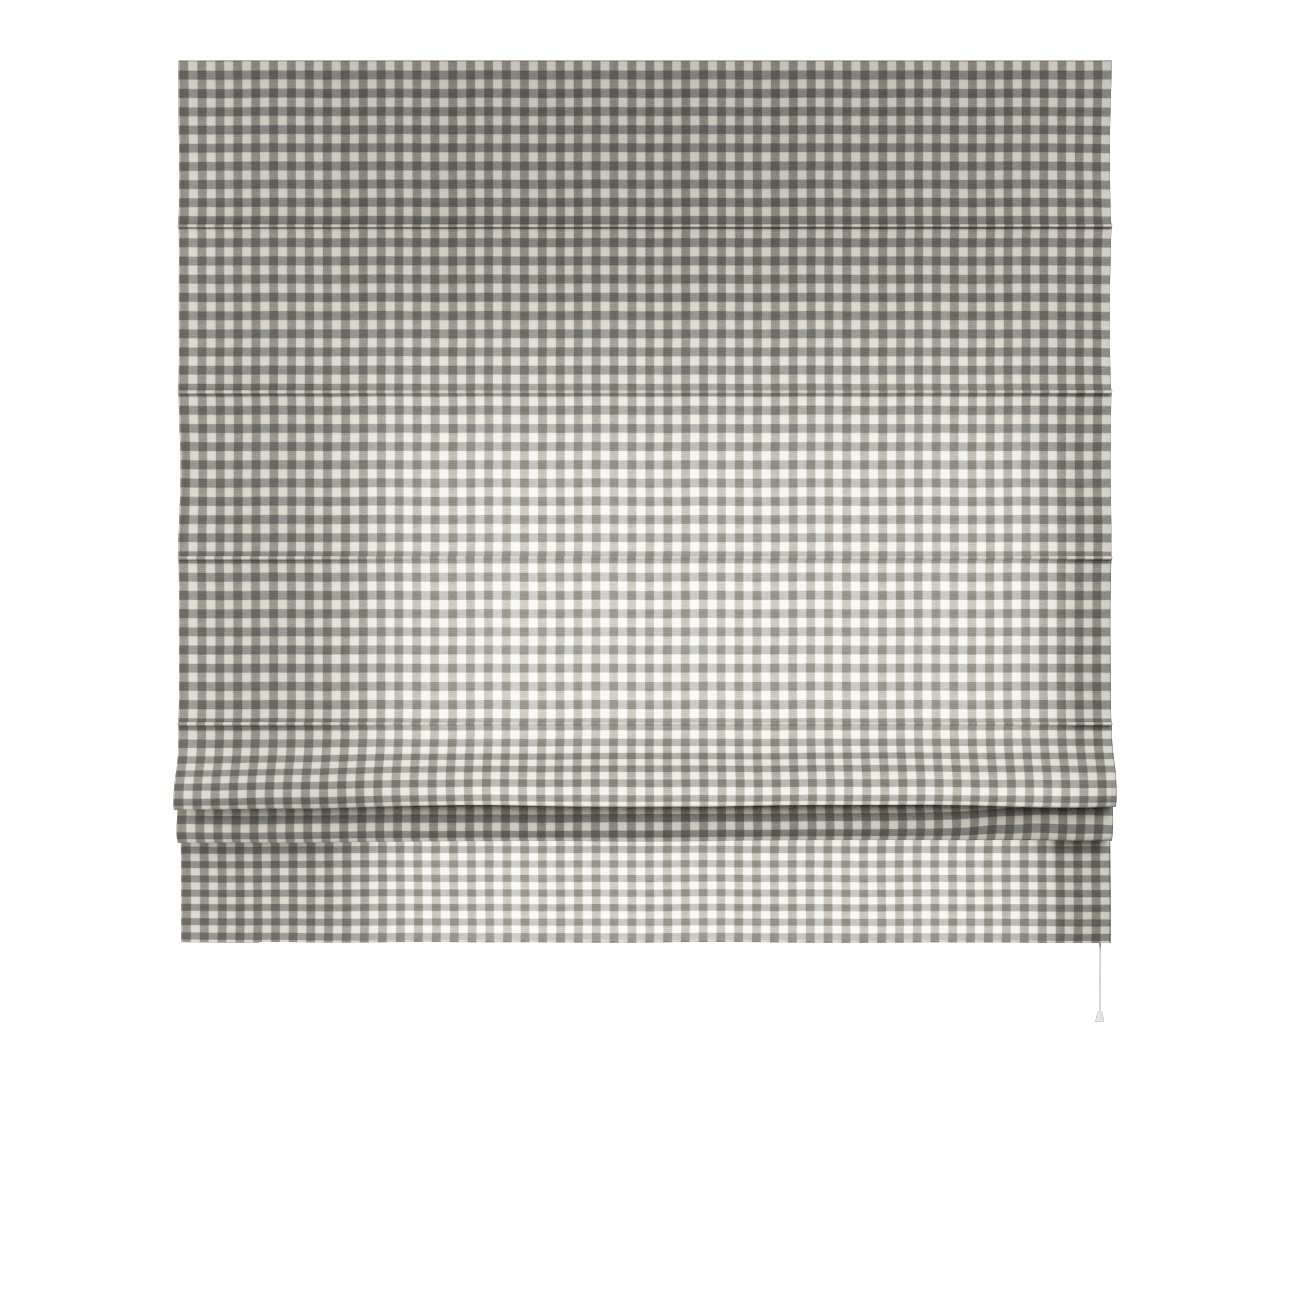 Romanetės Padva 80 x 170 cm (plotis x ilgis) kolekcijoje Quadro, audinys: 136-11